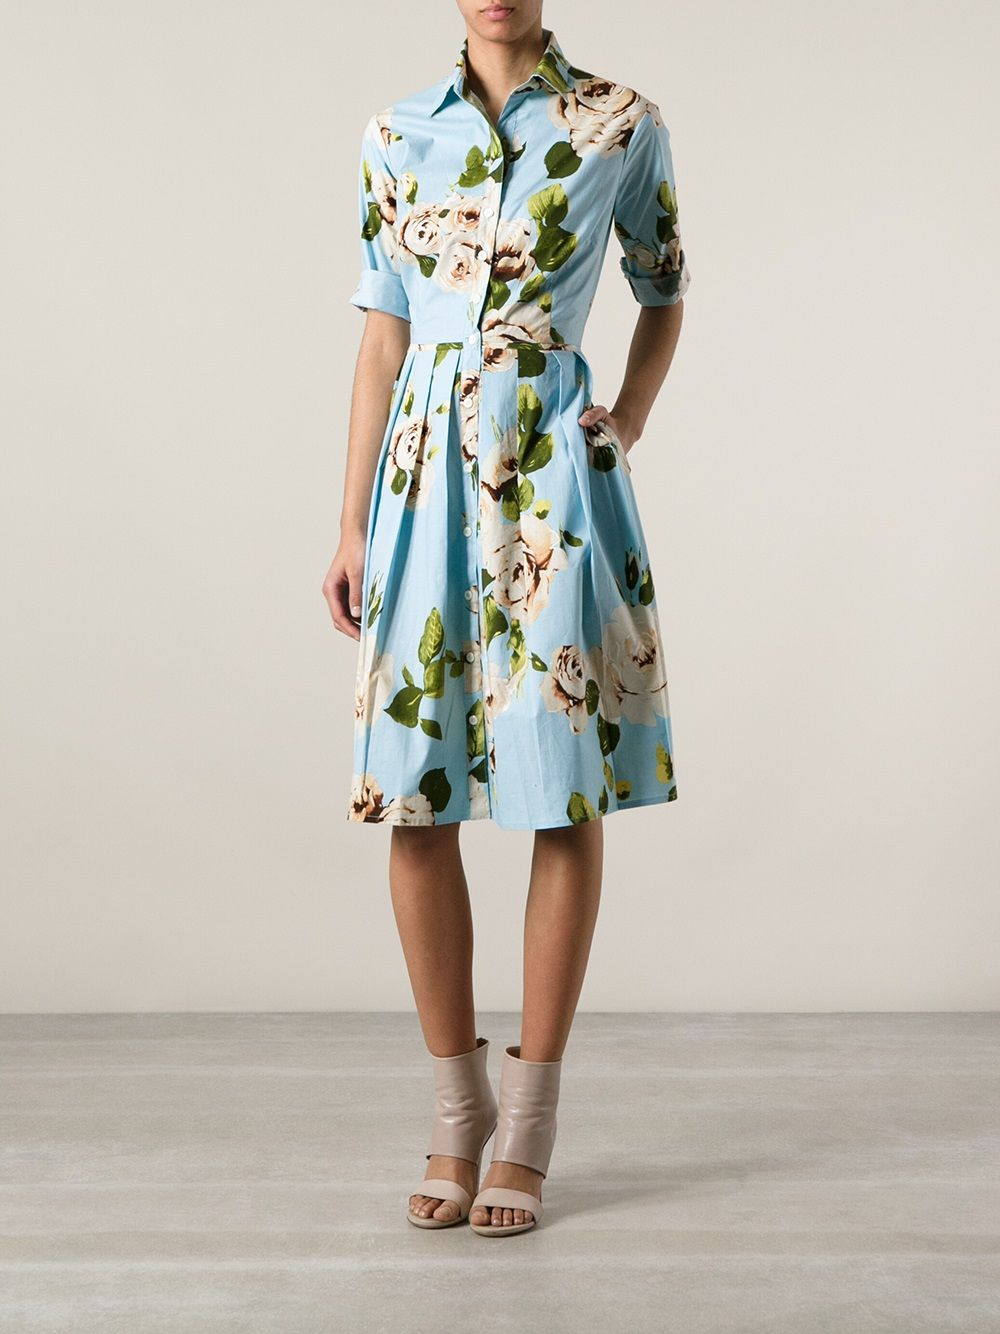 Samantha sung uaudreyu floral dress changing room farfetch